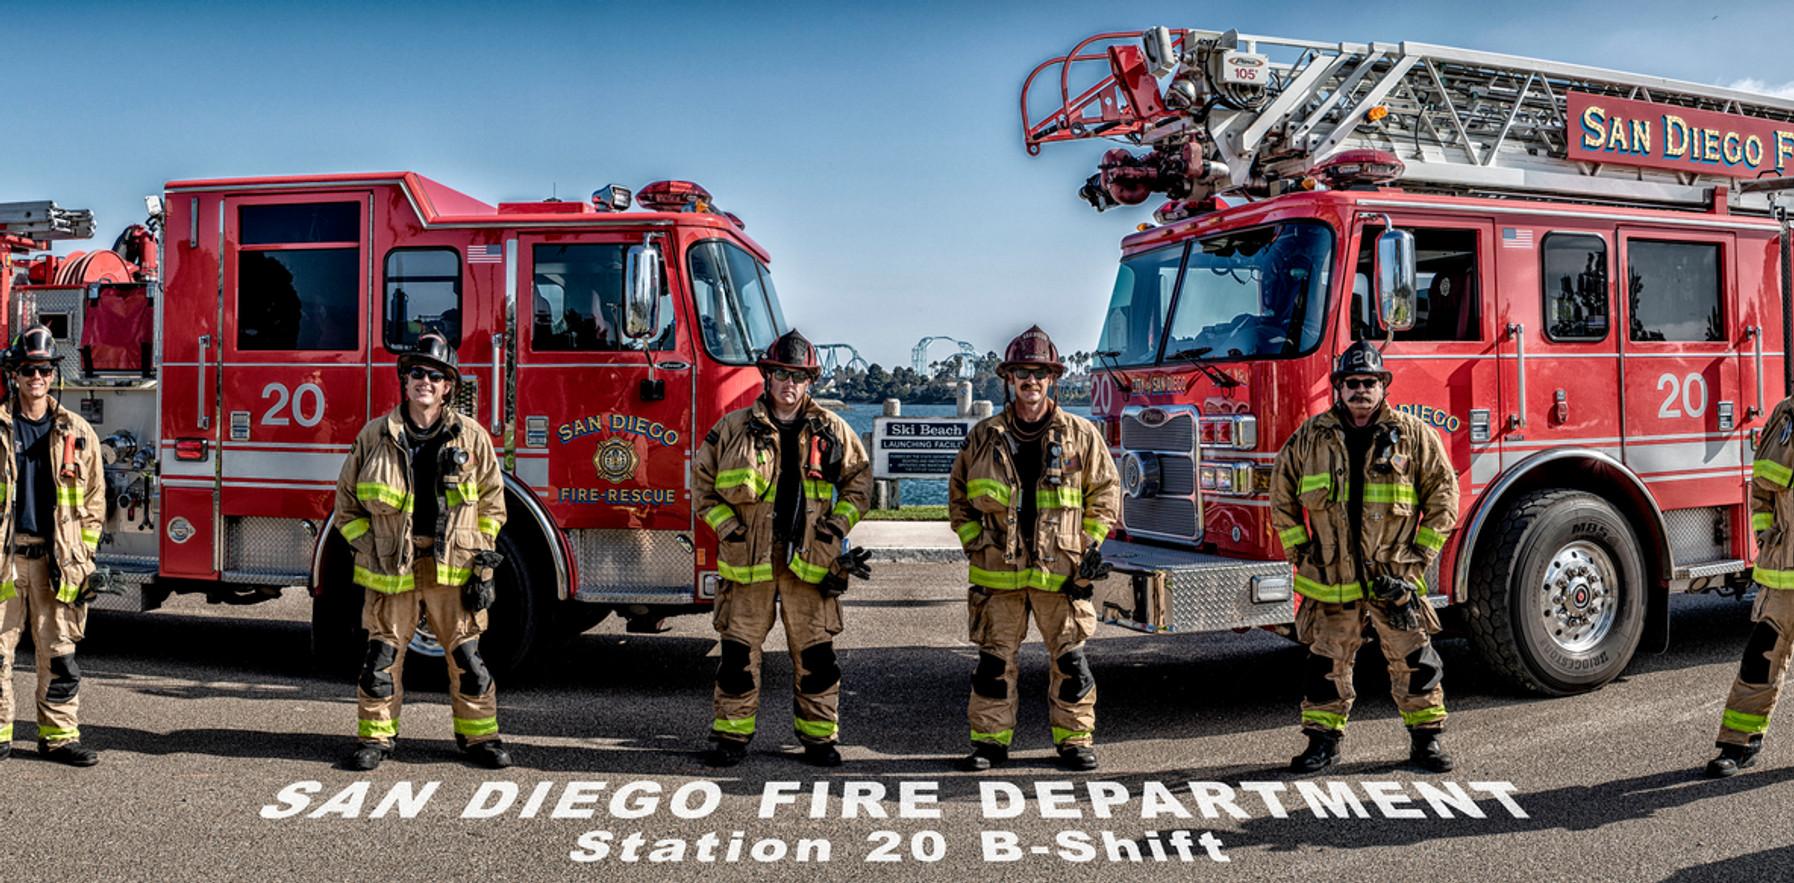 Smaller San Diego Station 20 Pano 1 Filt